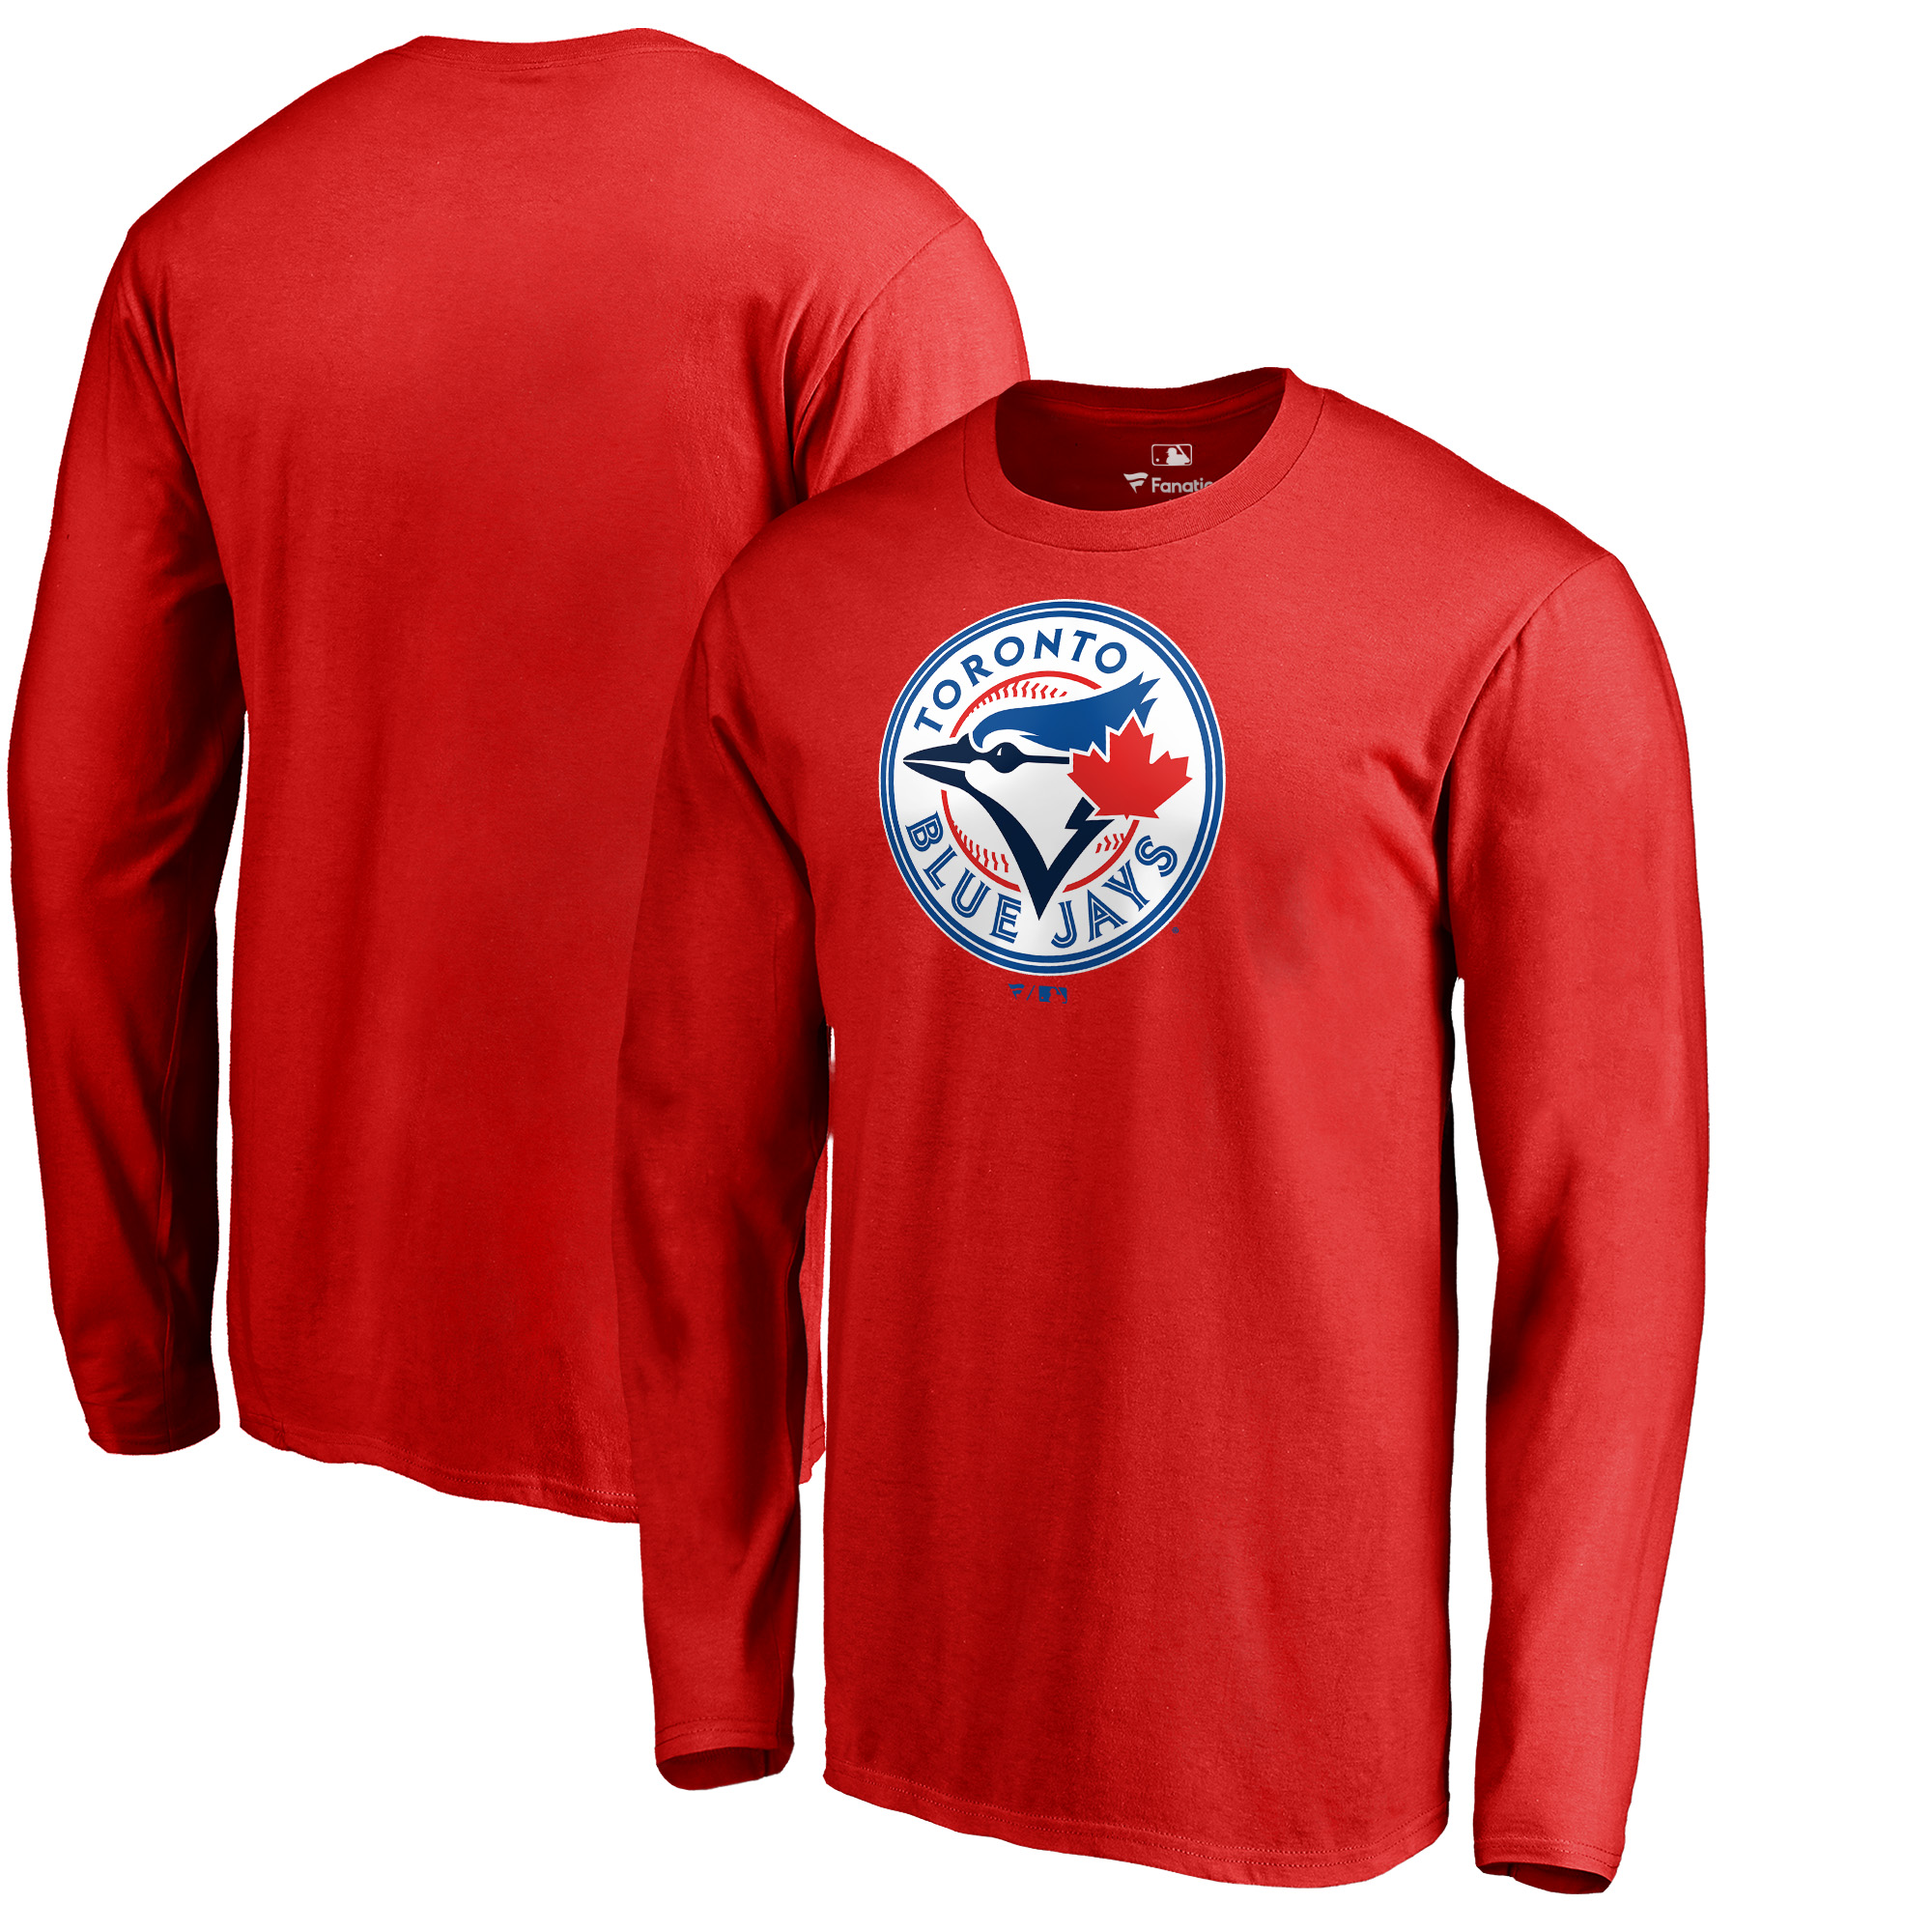 Toronto Blue Jays Fanatics Branded Big & Tall Team Wordmark Long Sleeve T-Shirt - Red